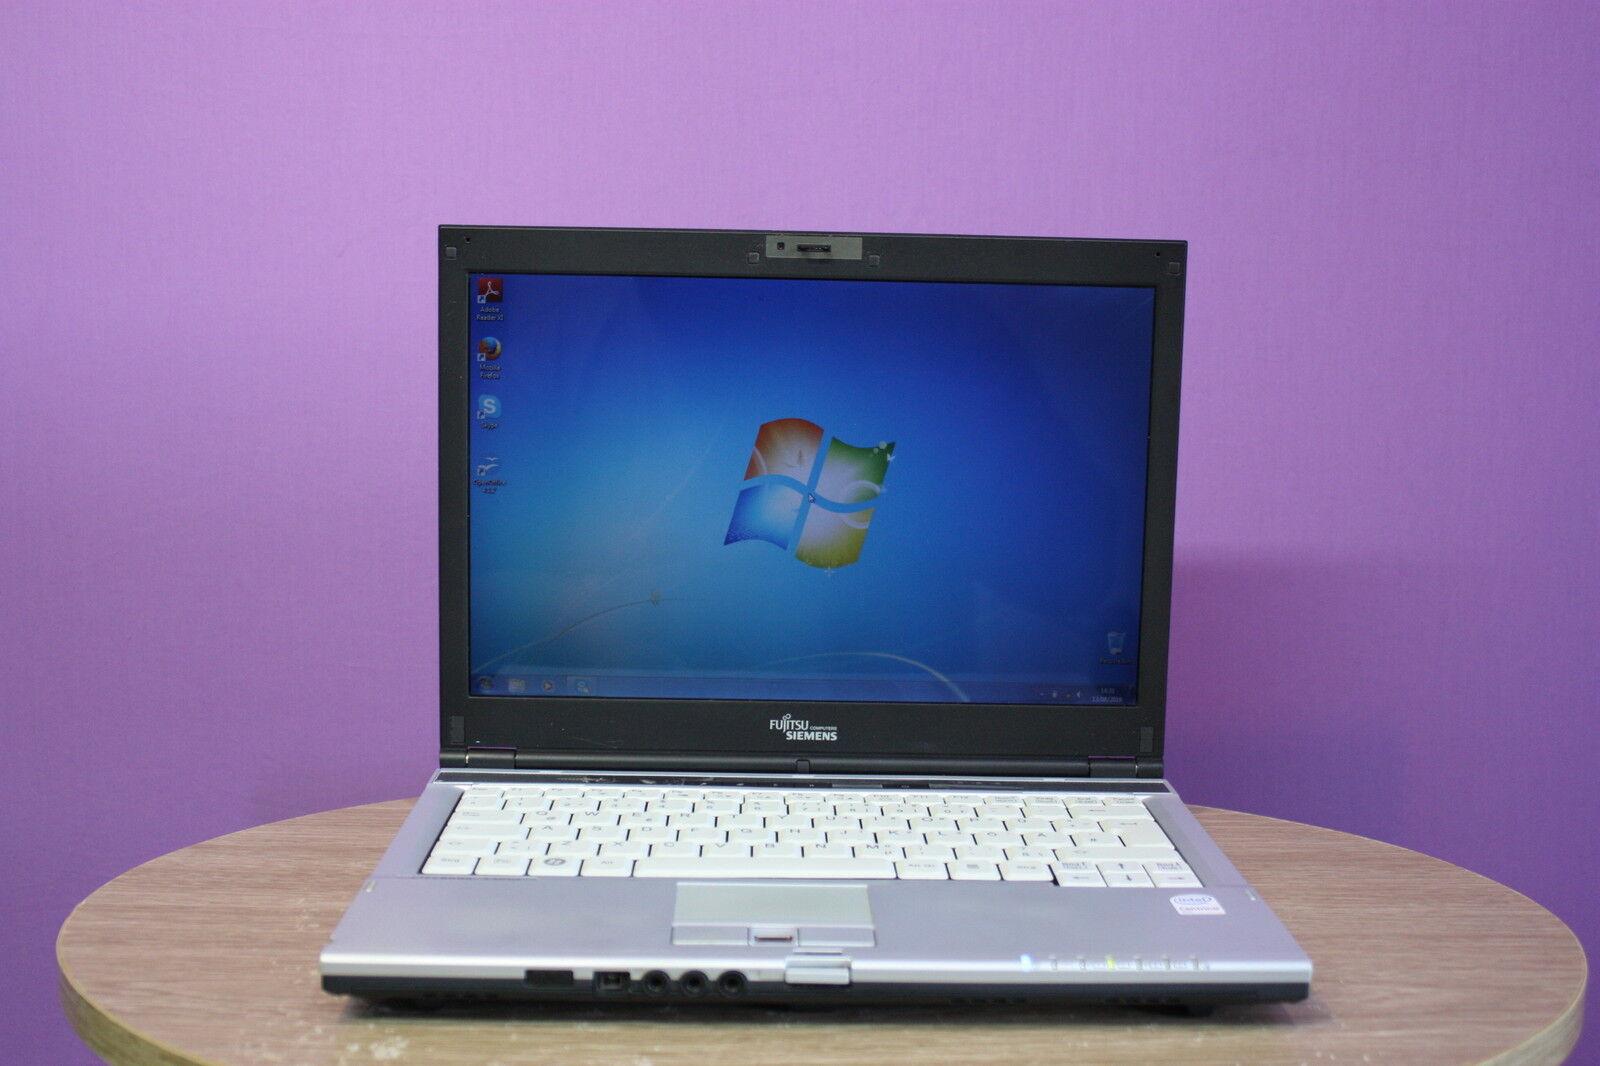 "Laptop Fujitsu S6410 13.3"" Core 2 Duo 2GHZ 2GB 80GB WEBCAM Windows 7 Genuine"